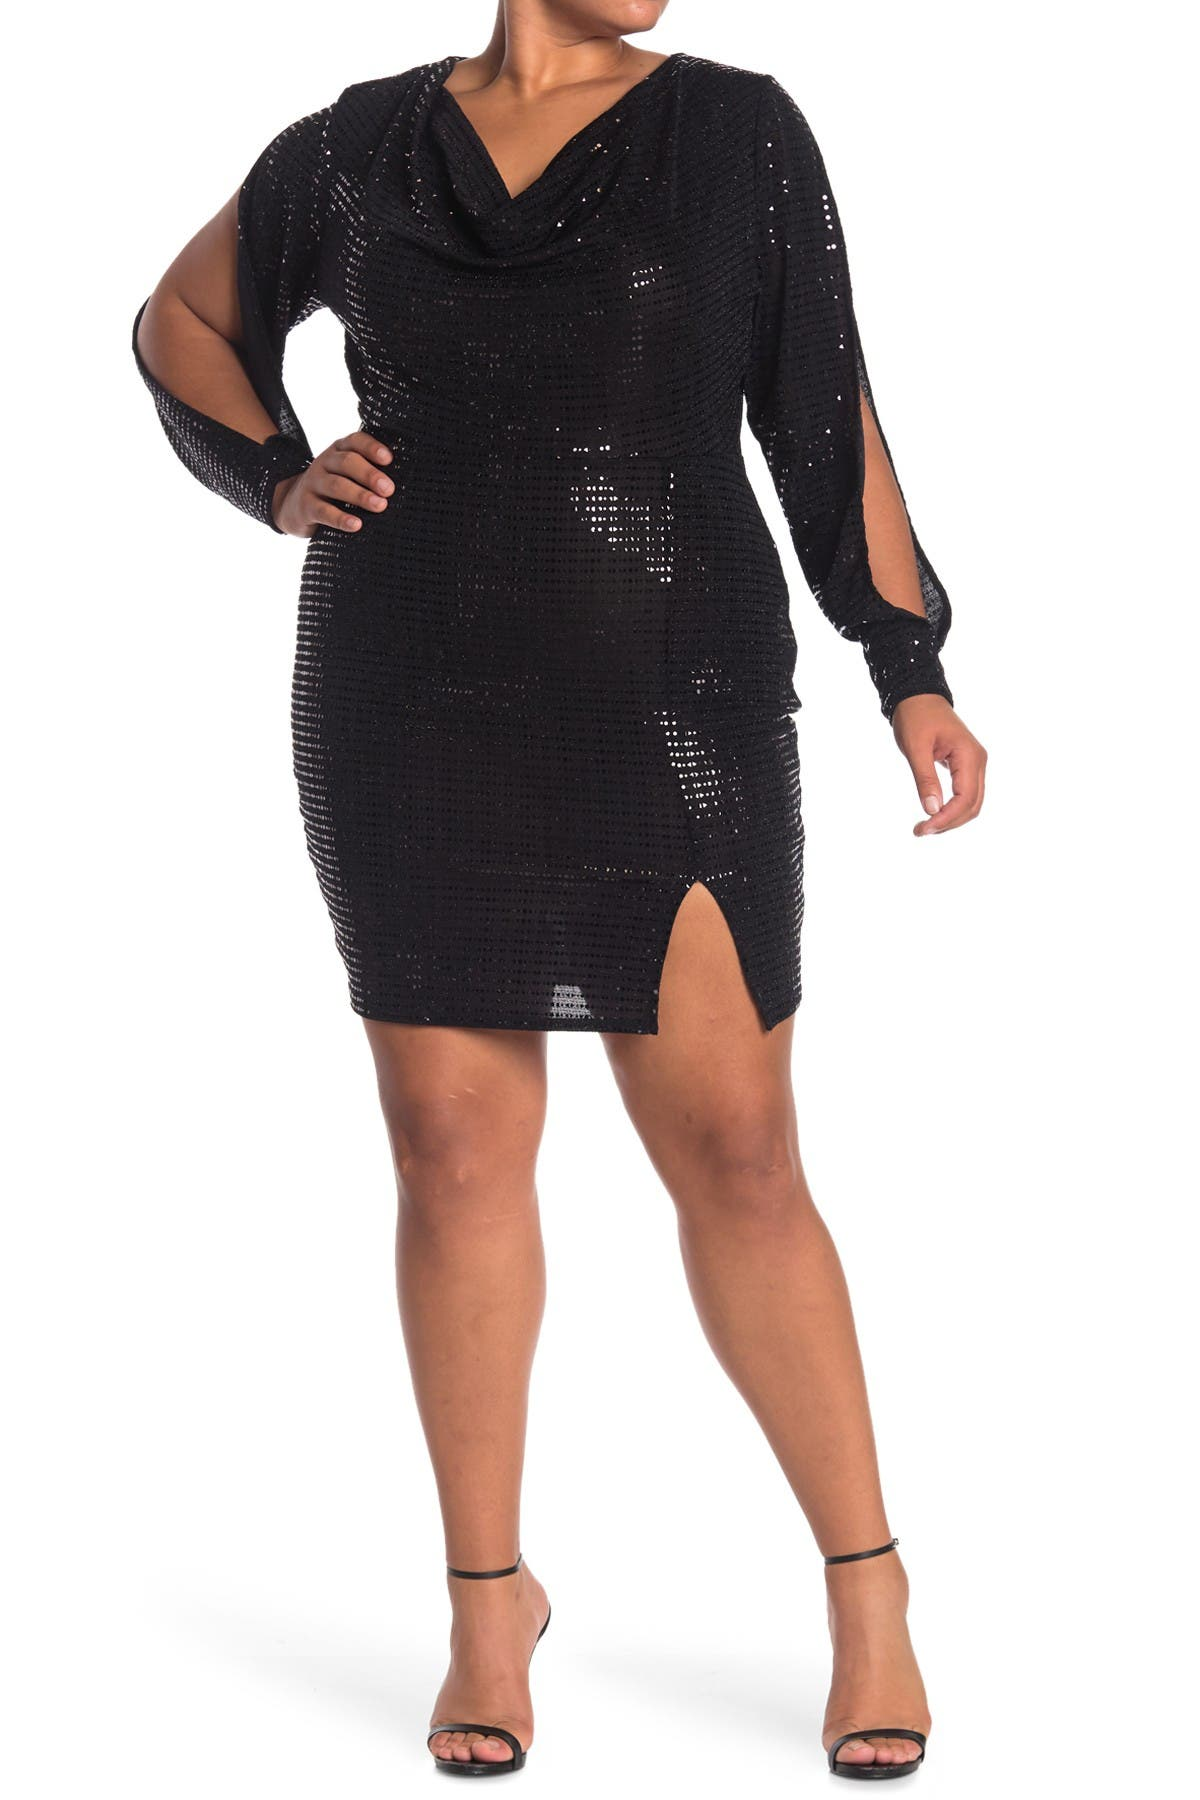 Curvy Sense Allie Cowl Neck Dress